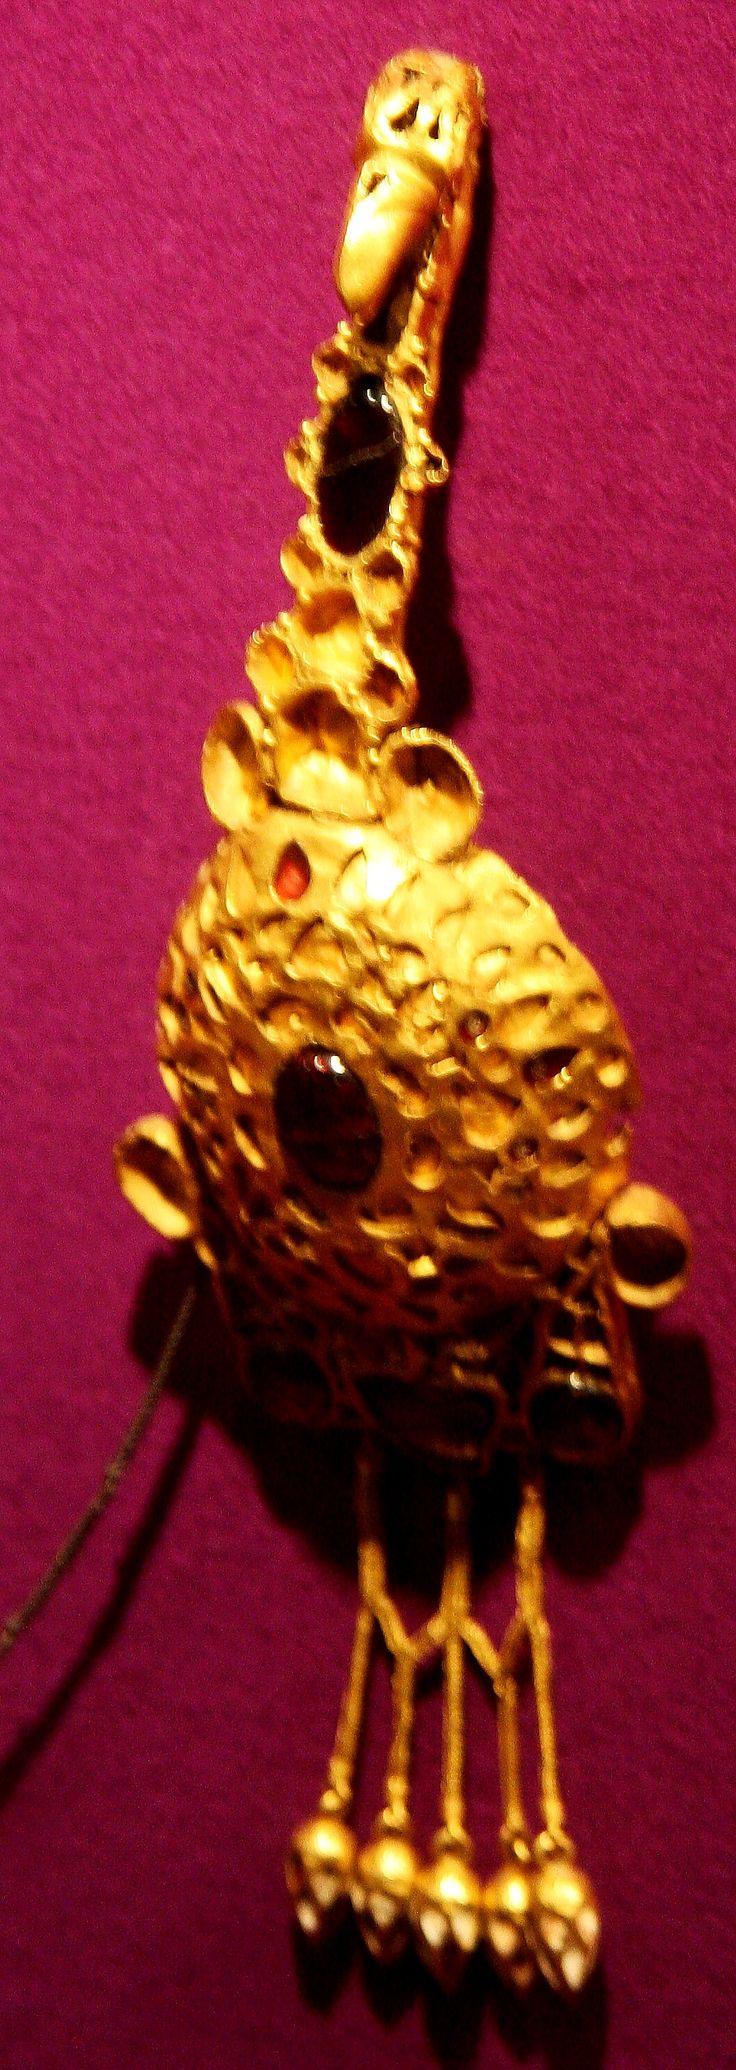 Fibula di dimensioni medie a forma d'uccello ( aquila ?) da Pietroasele. Bird-shaped fibula from Pietroasele hoard.